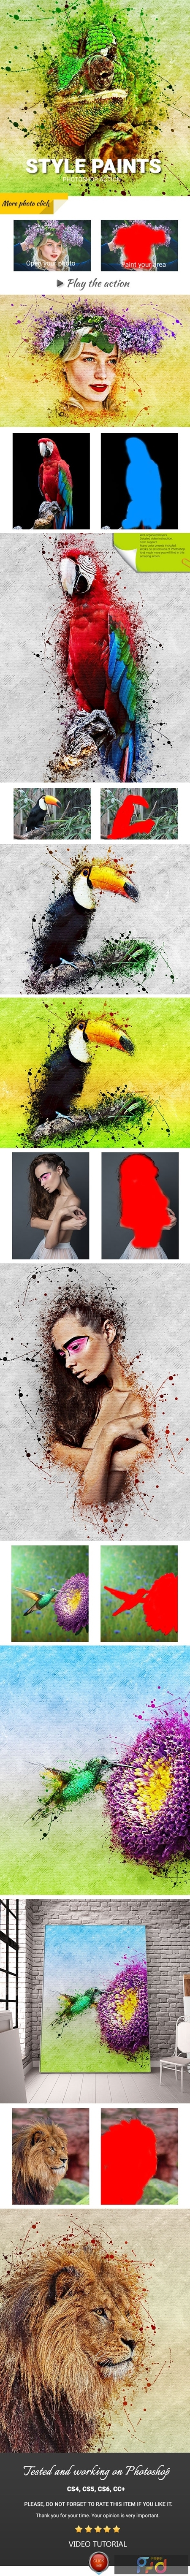 Style Paints Photoshop Action 25674415 1